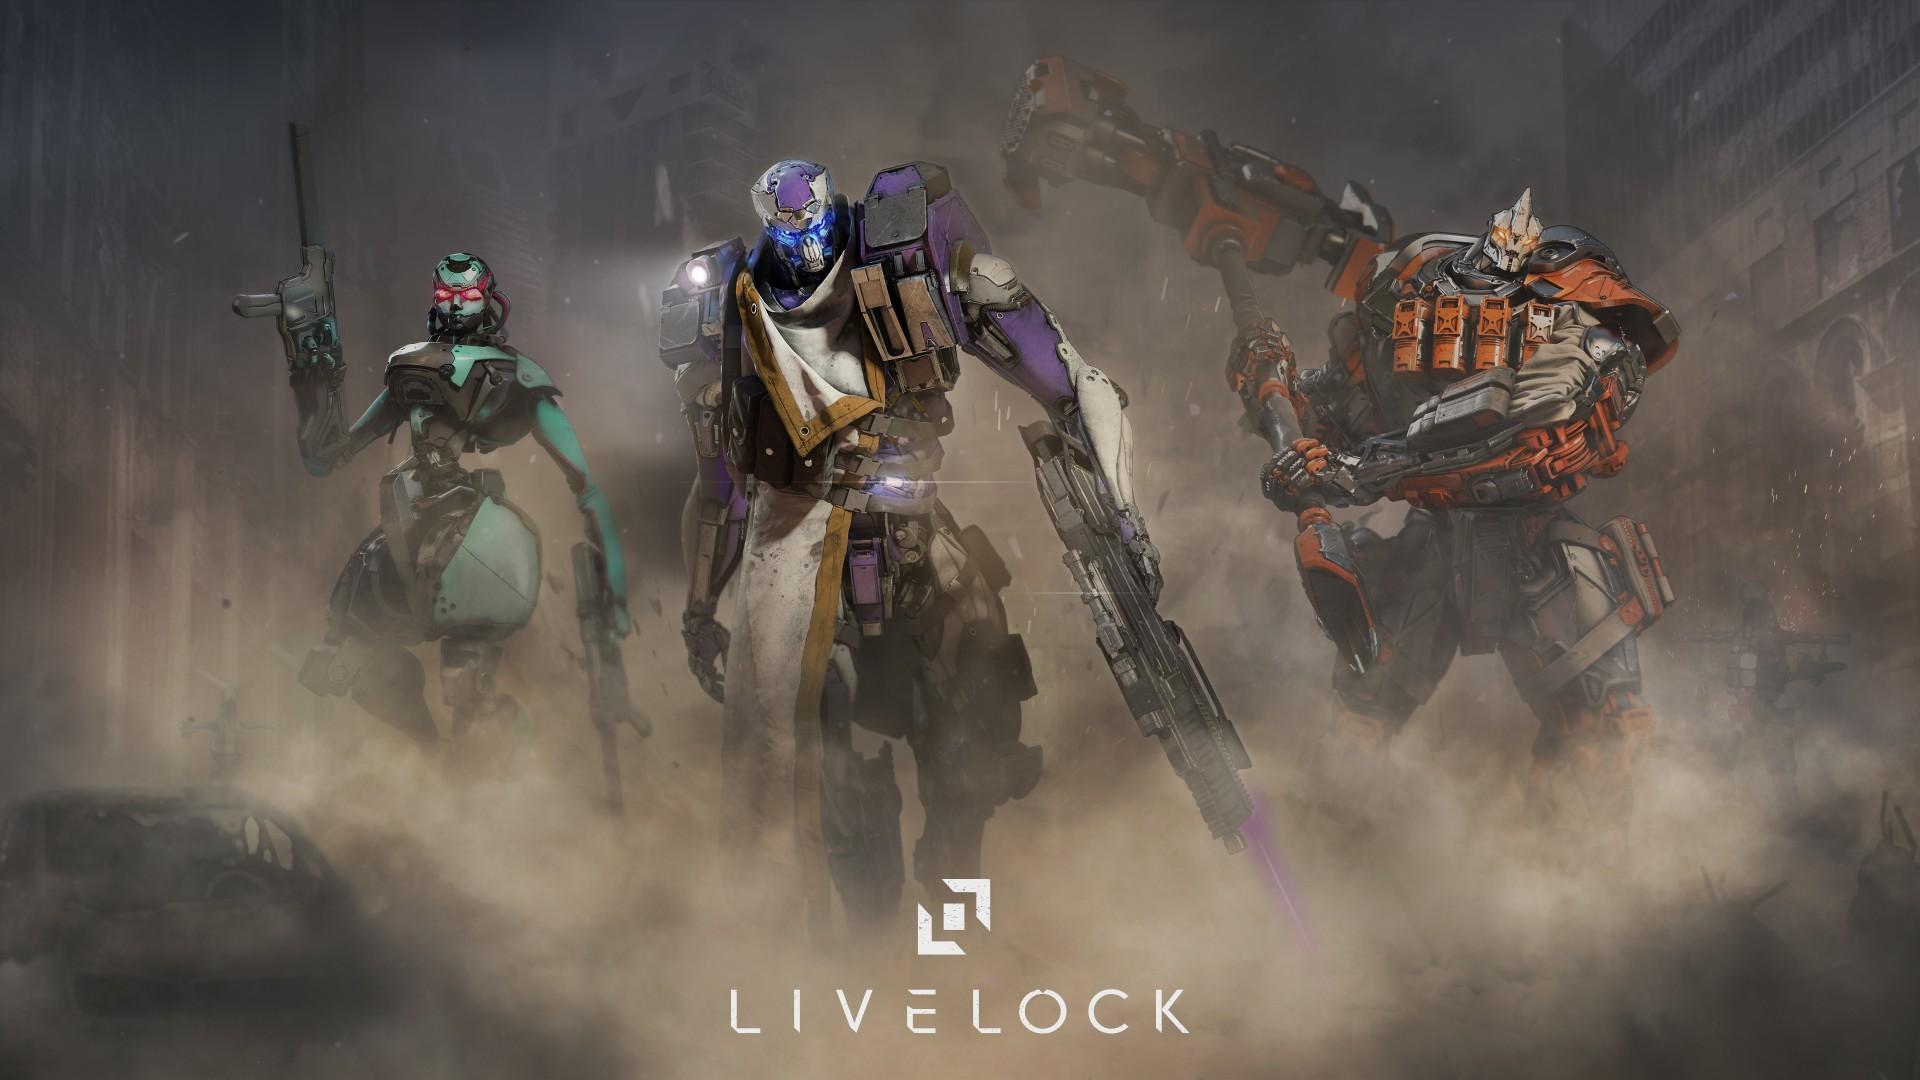 Wallpaper Livelock Giant Shooter Best Games Games 11717